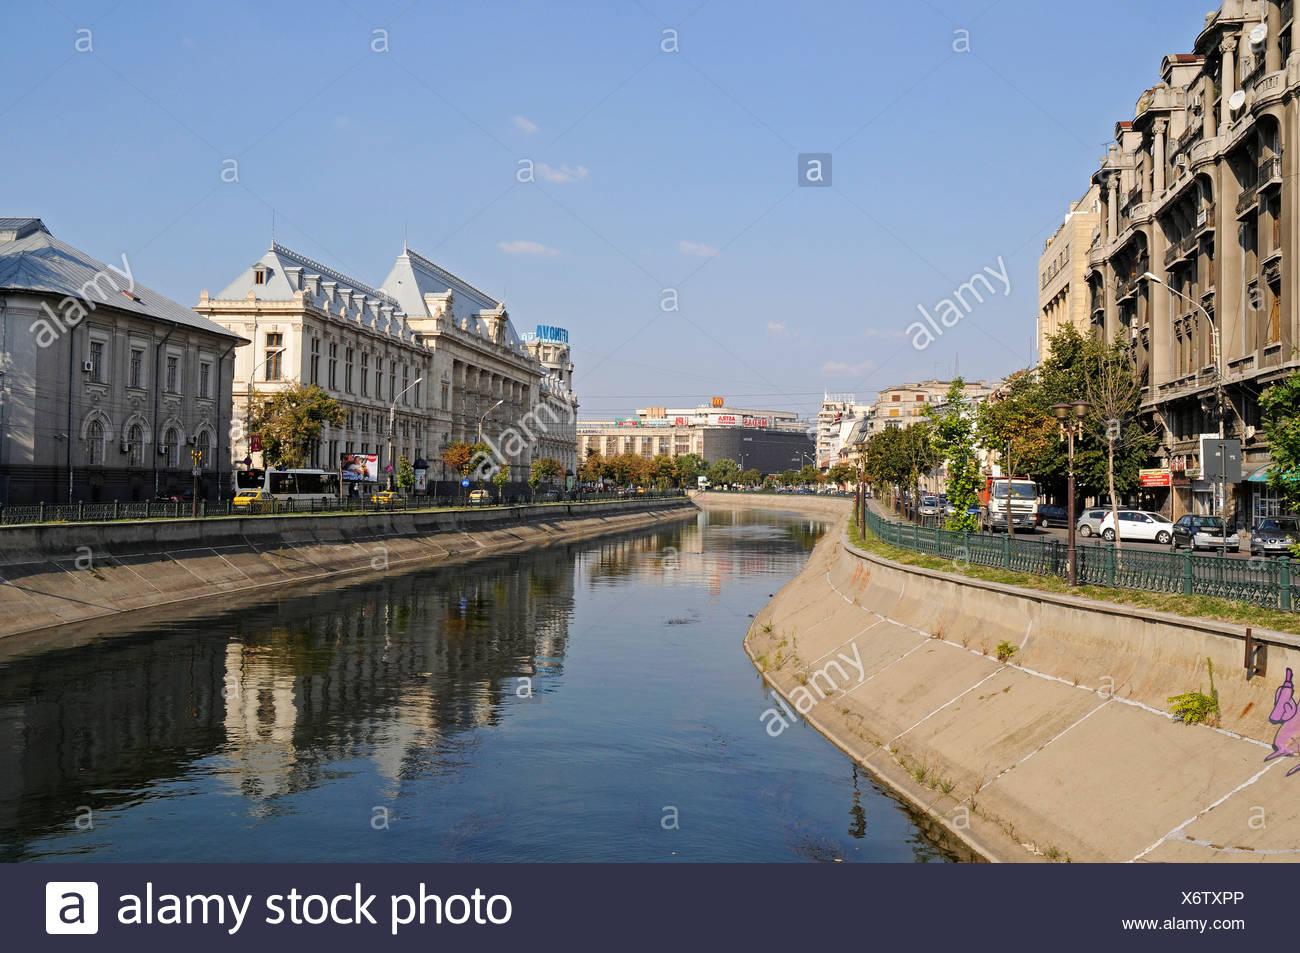 Dambovita River, Piata Natiunile Unite square, Bucharest, Romania, Eastern Europe, Europe, PublicGround - Stock Image